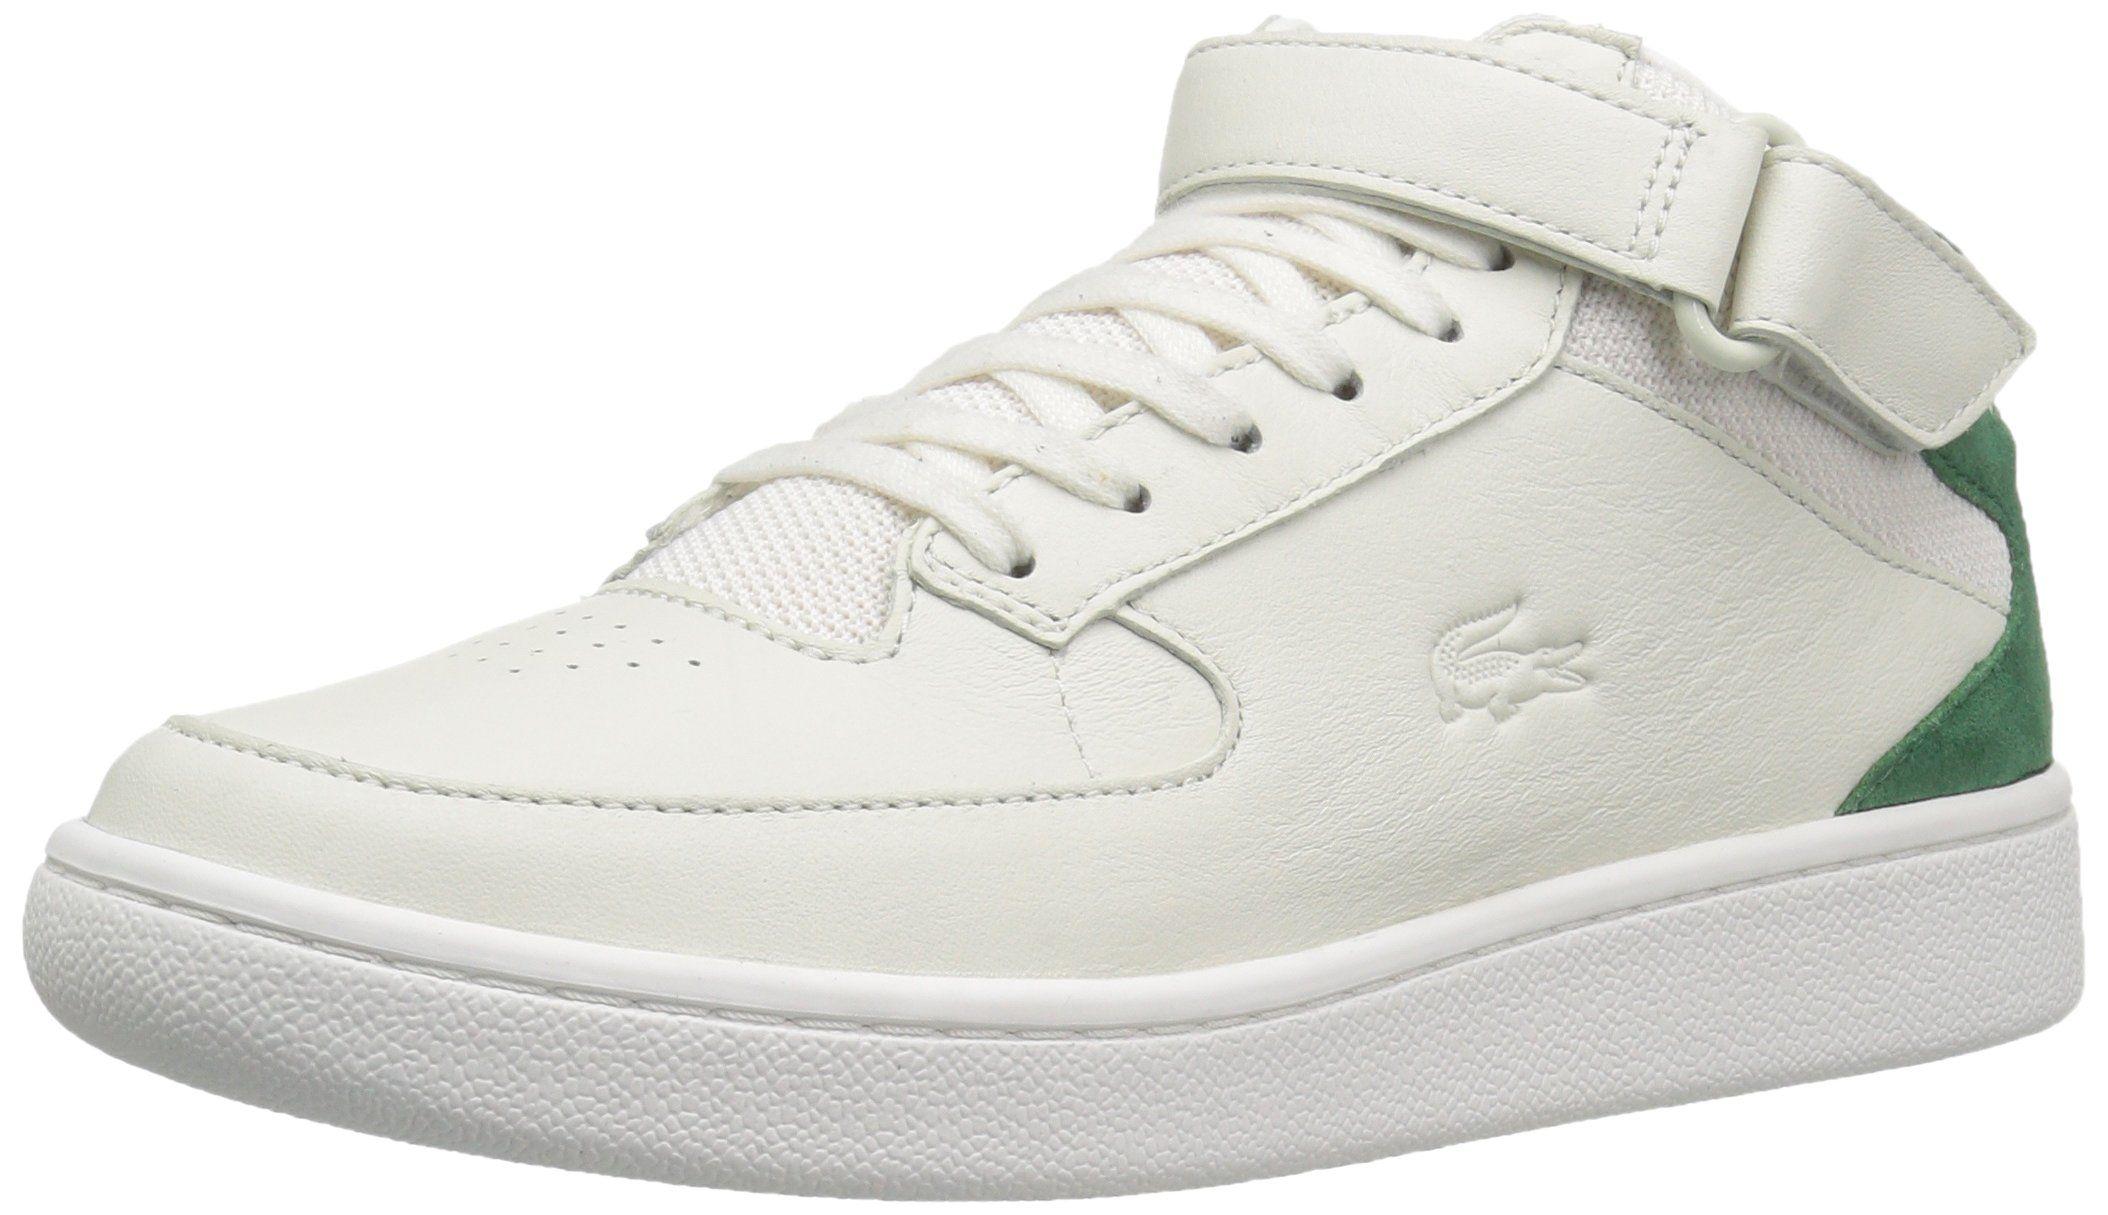 e7672daf062586 Lacoste Men s Turbo 117 1 Casual Shoe Fashion Sneaker